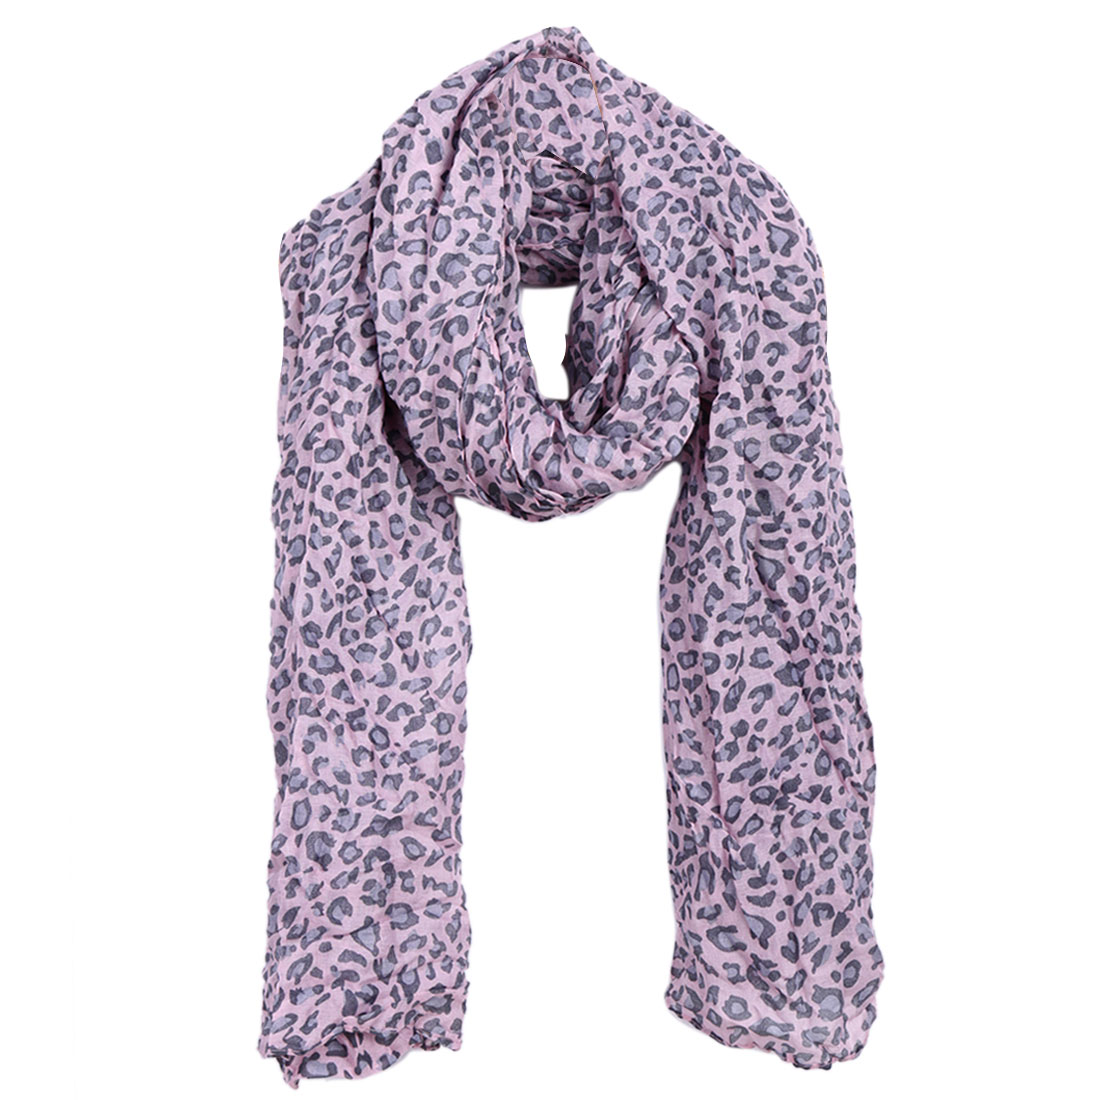 Women Semi Sheer Warm Winter Scarf Light Pink Gray